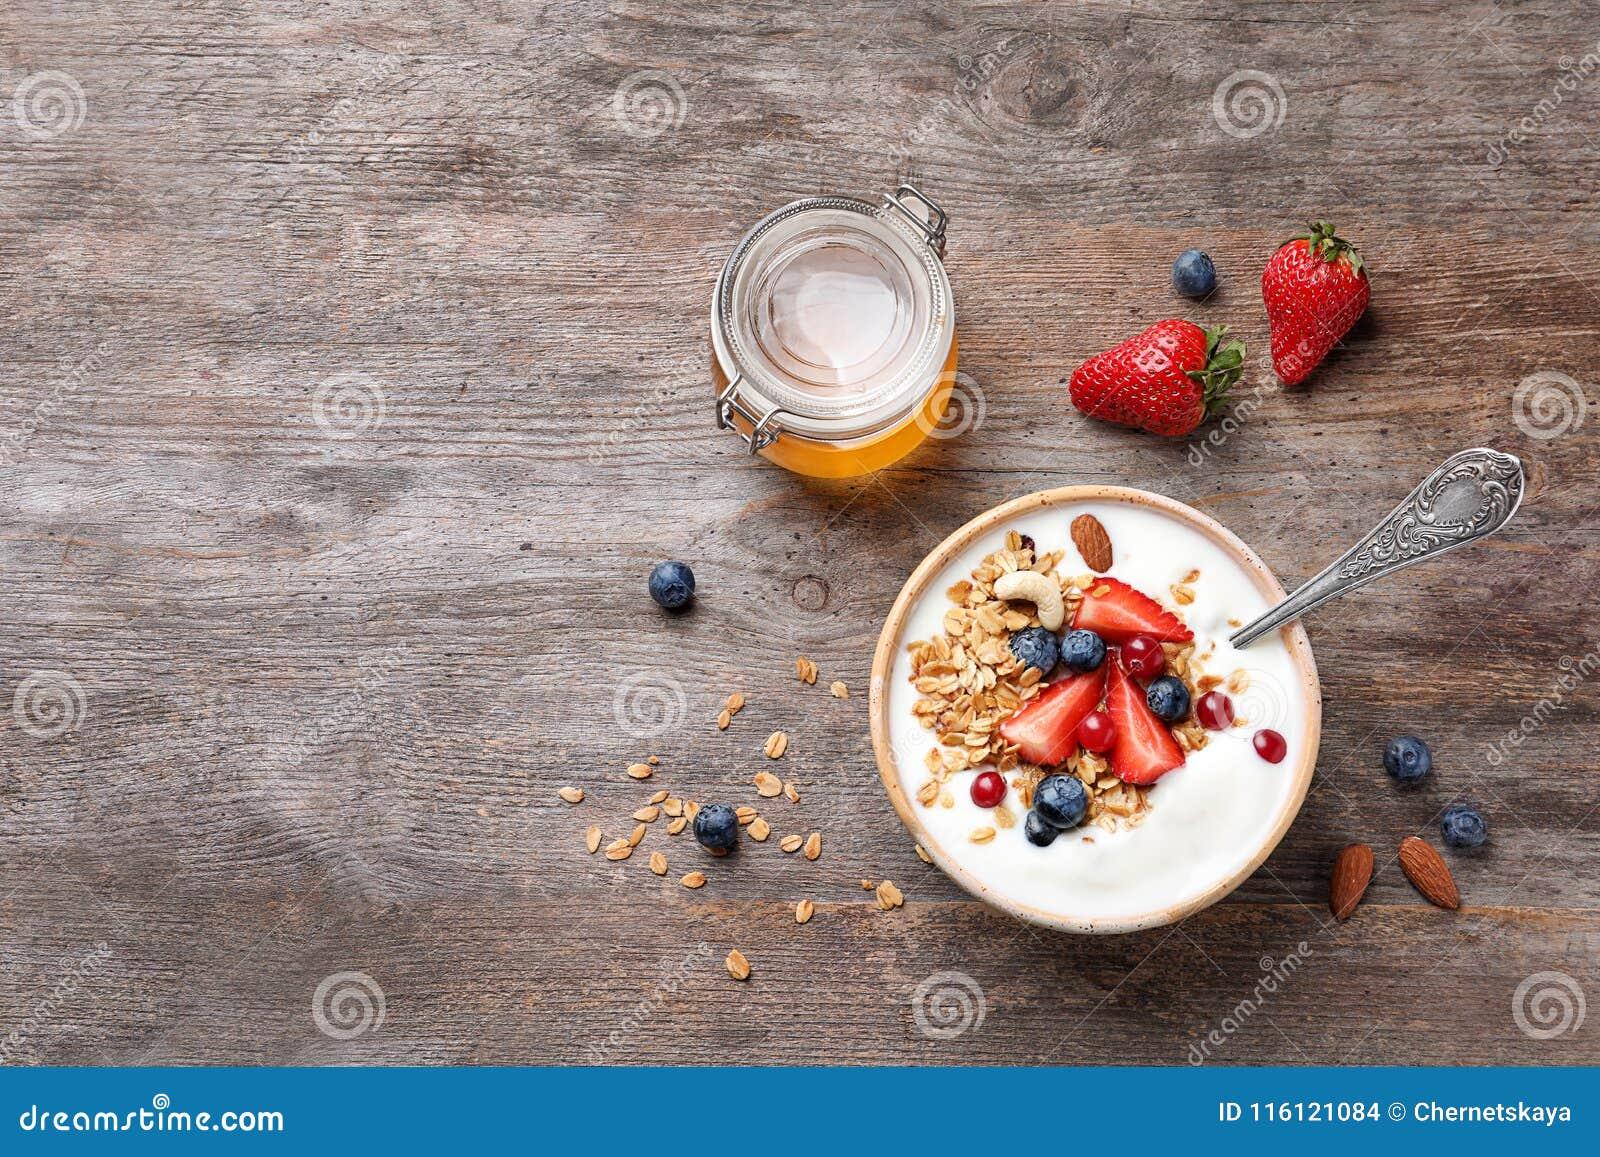 Tasty breakfast with yogurt, berries and granola